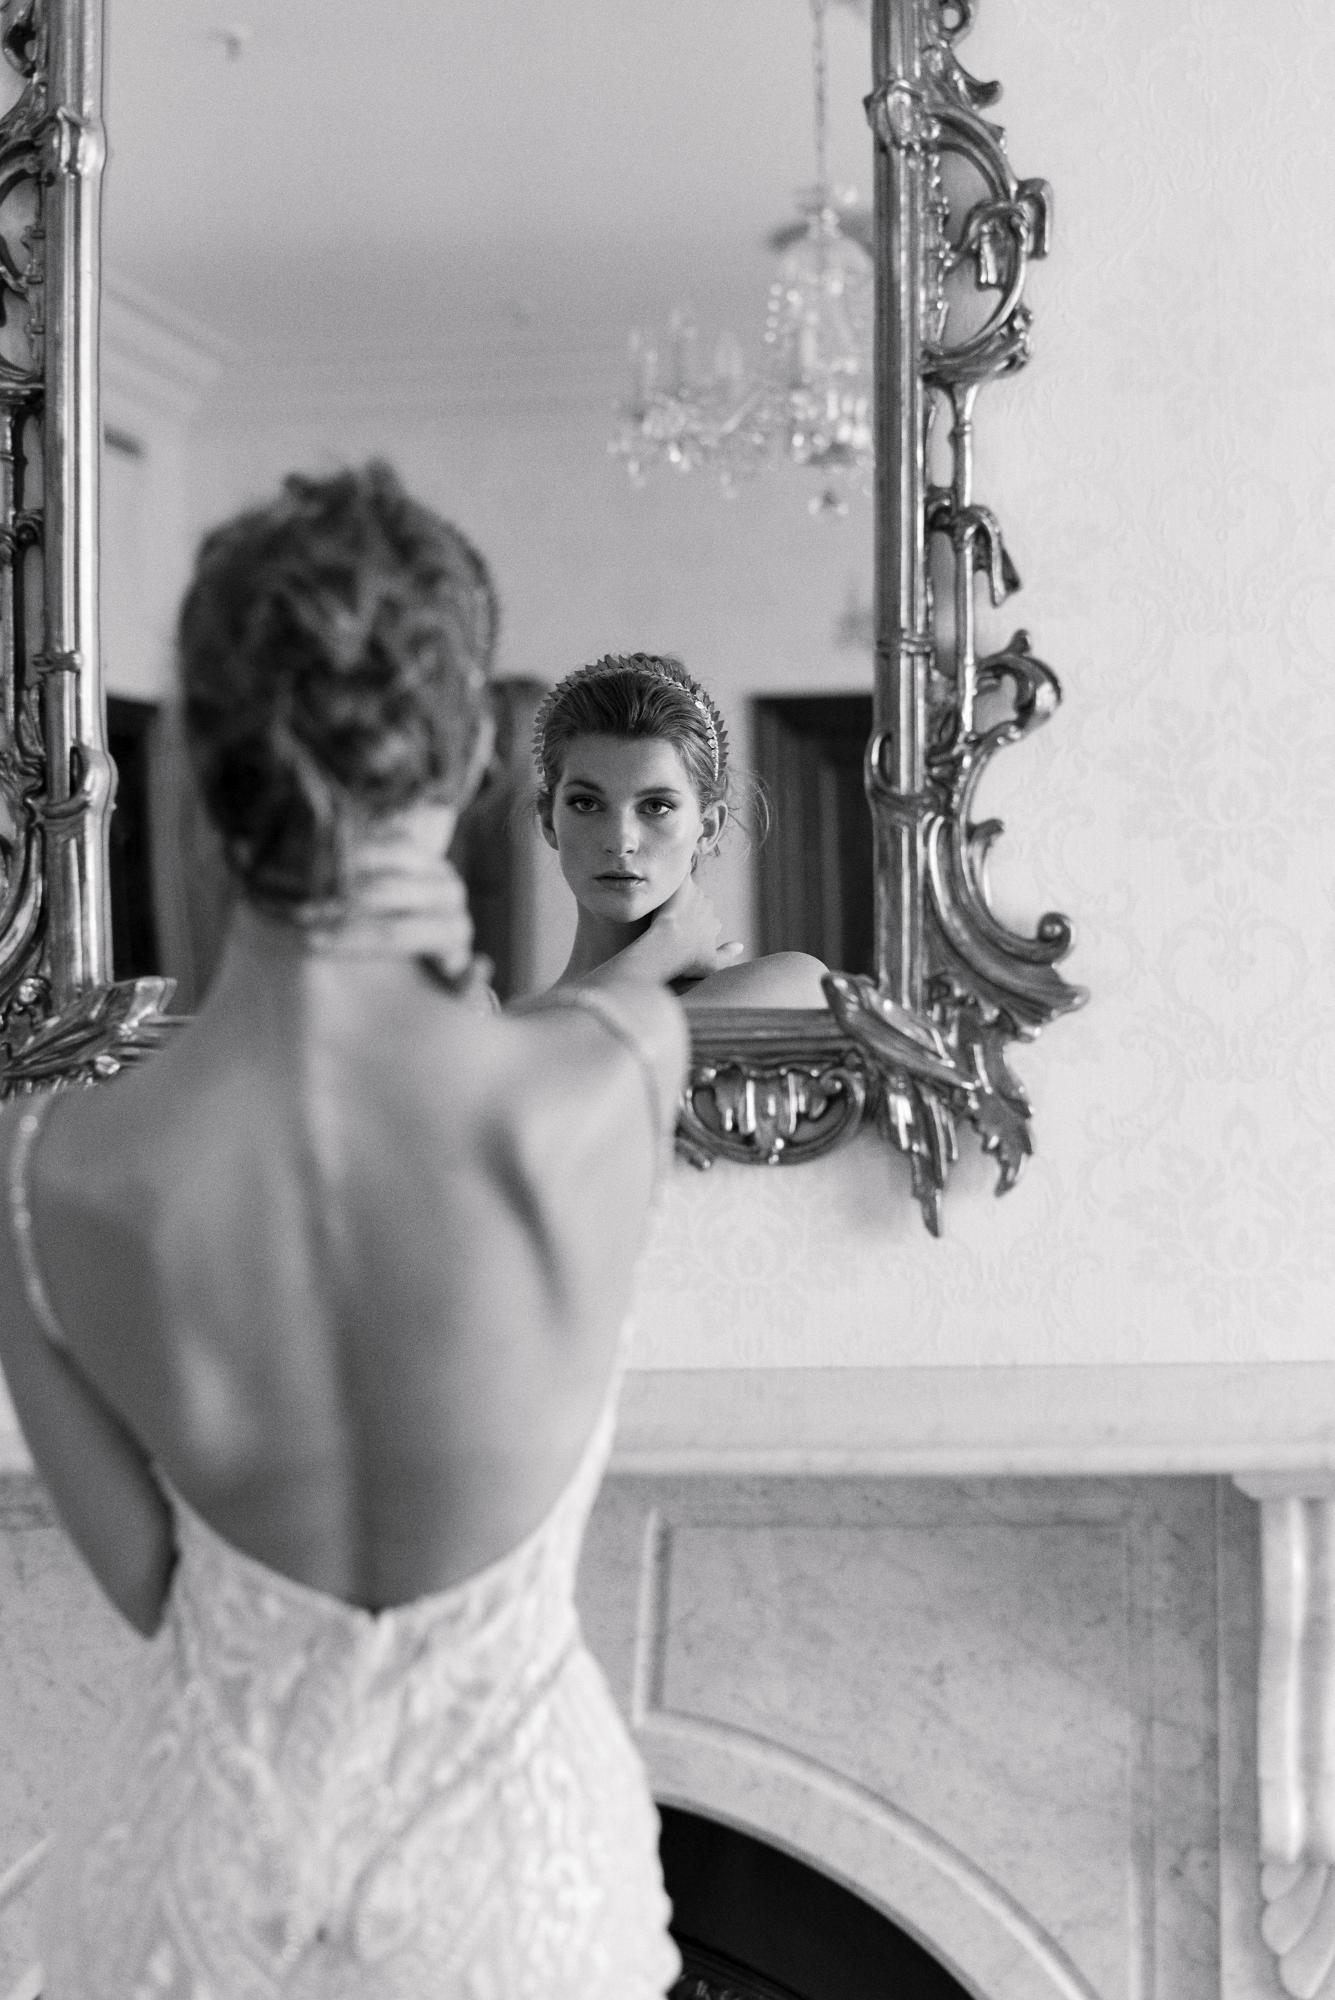 Sephory Photography-Her Morning Elegance Print 084 (1335x2000)